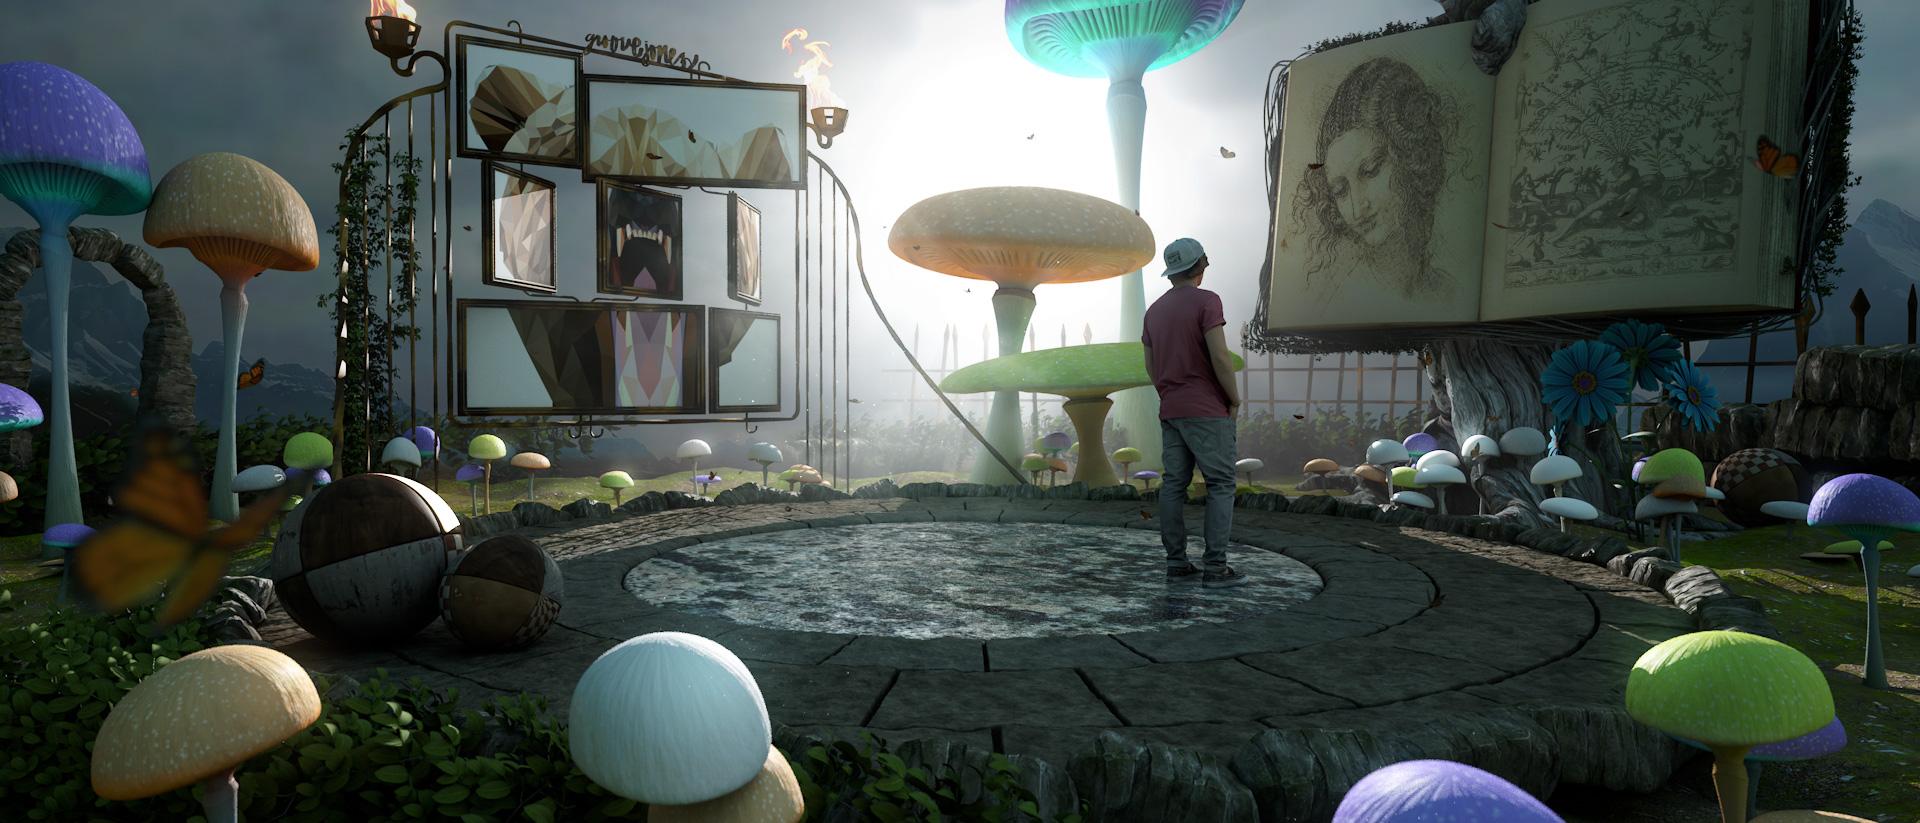 Groove Jones and Dallas' Aurora Event - Arcade Artist VR